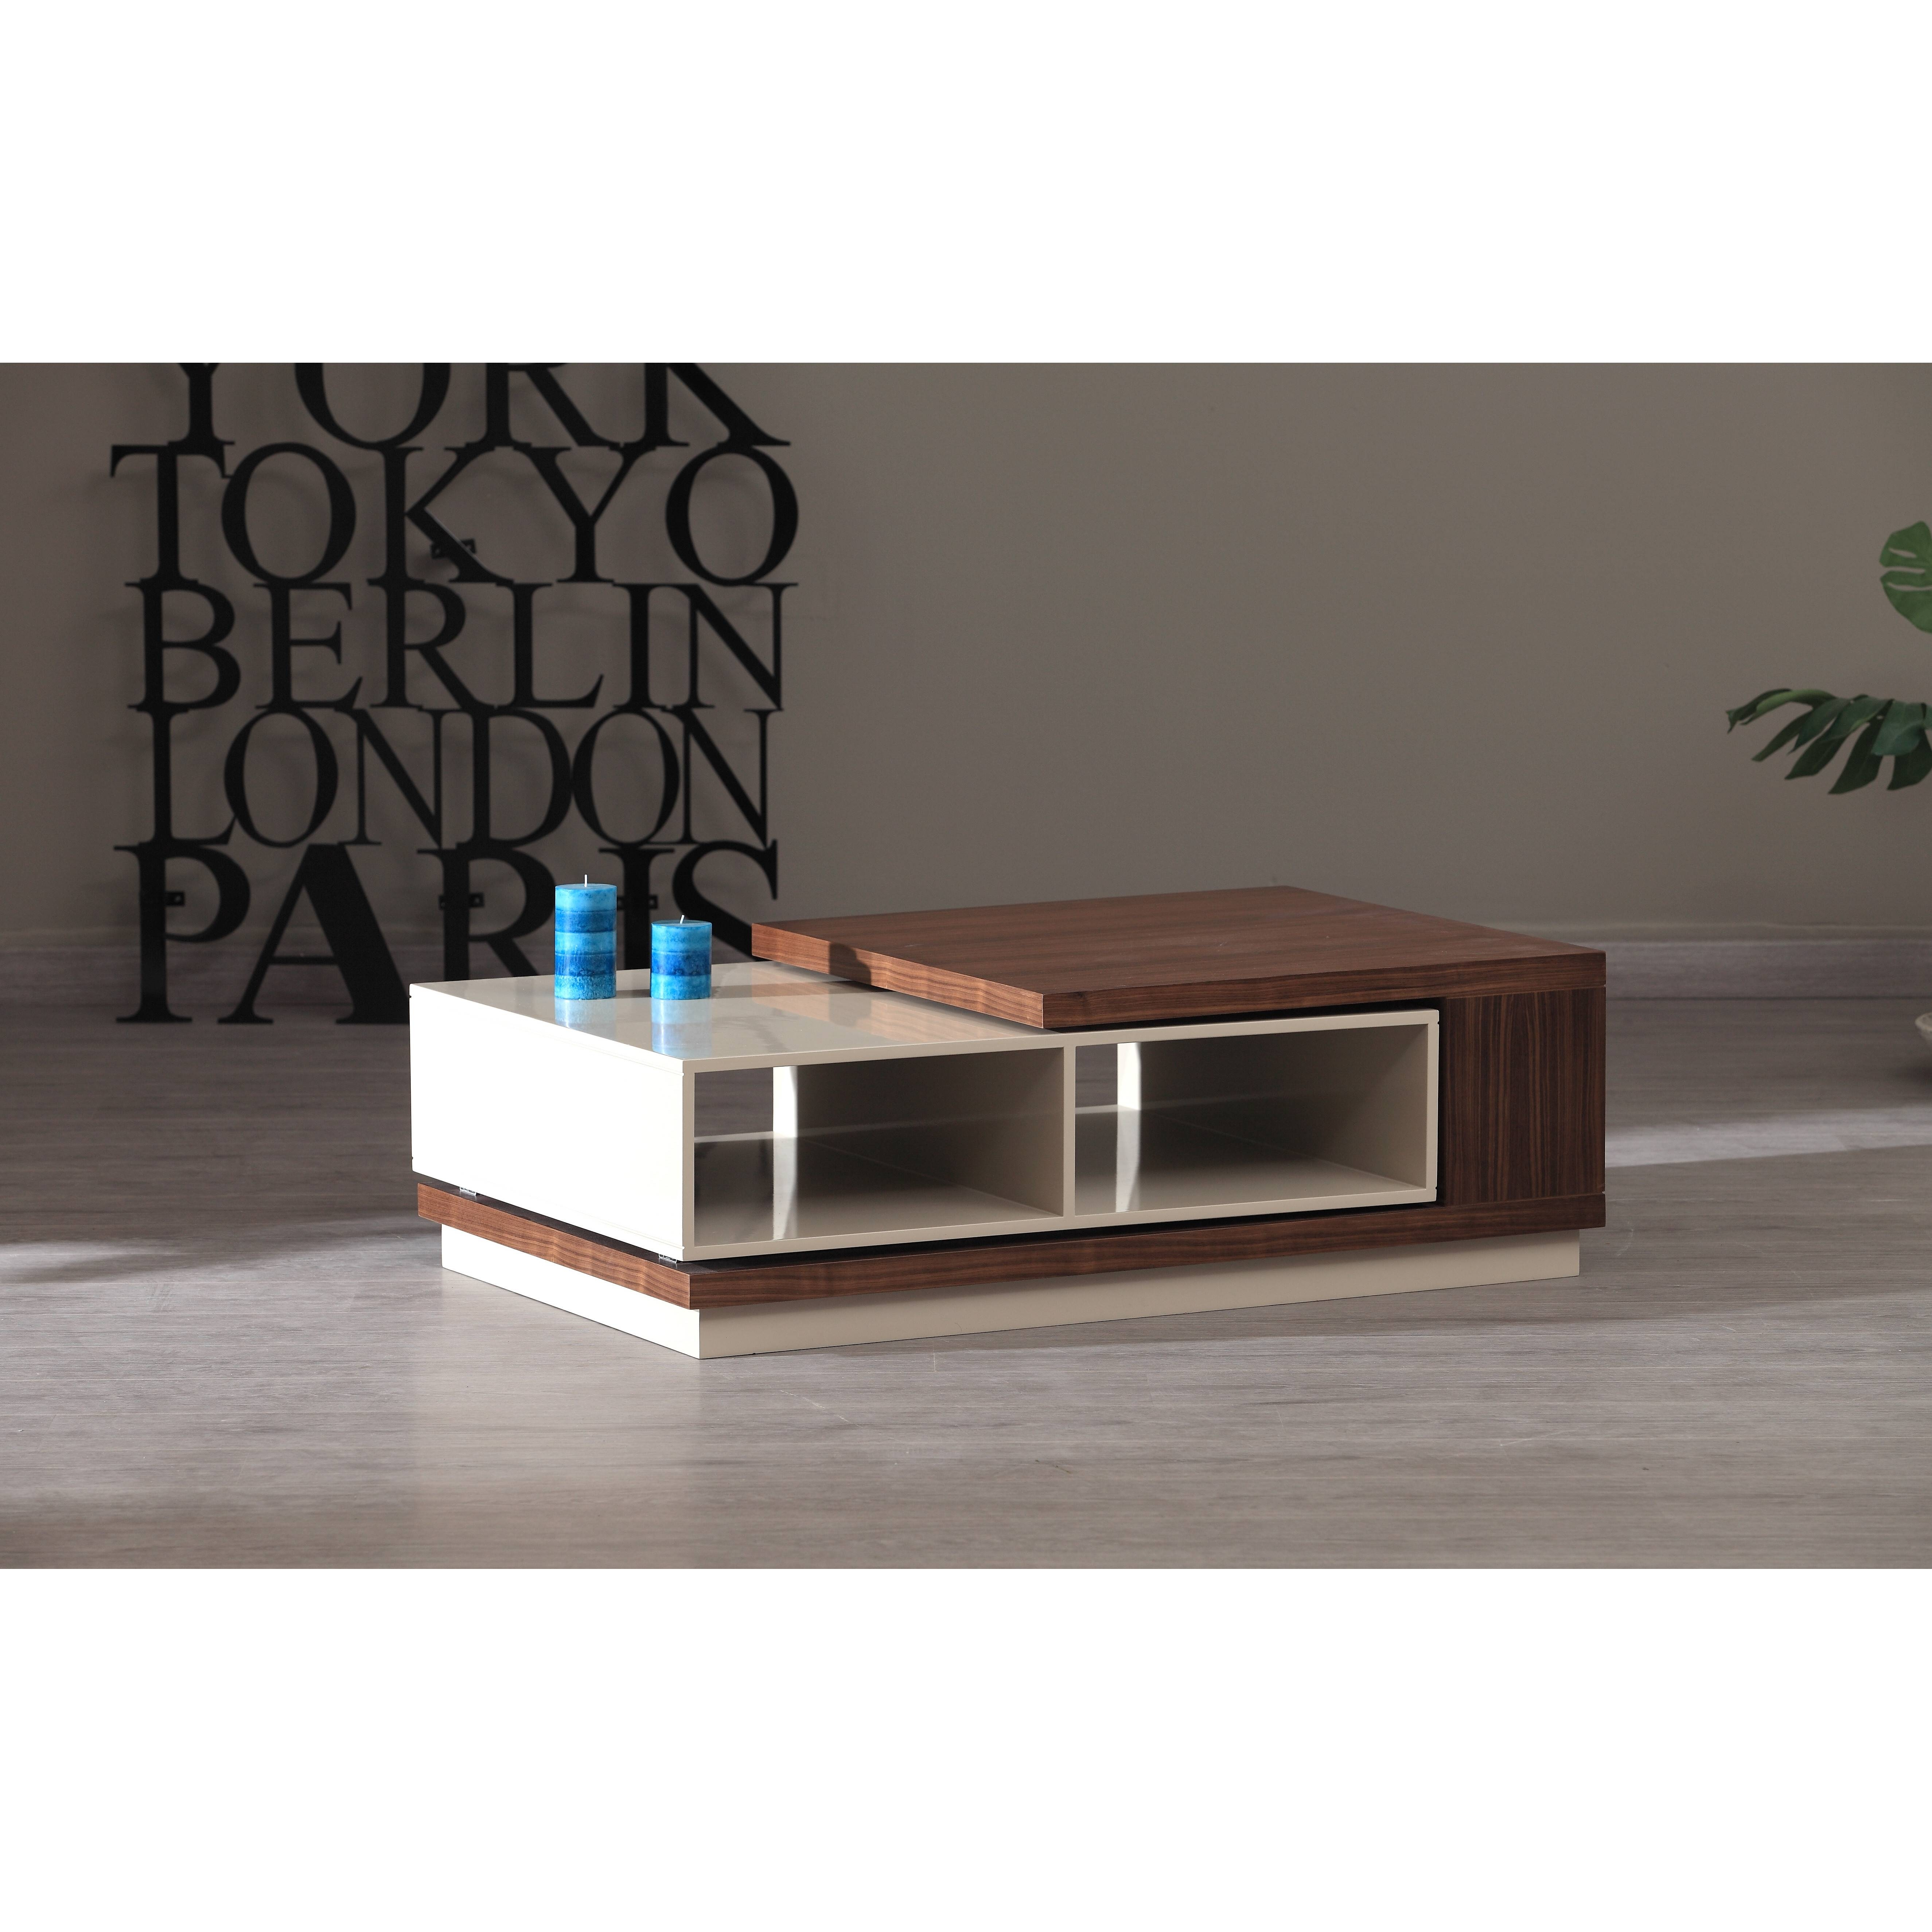 La Table Basse Design Comme Un Vrai Bijou Séjour | Coffee, Tables pertaining to Elevating Coffee Tables (Image 19 of 30)